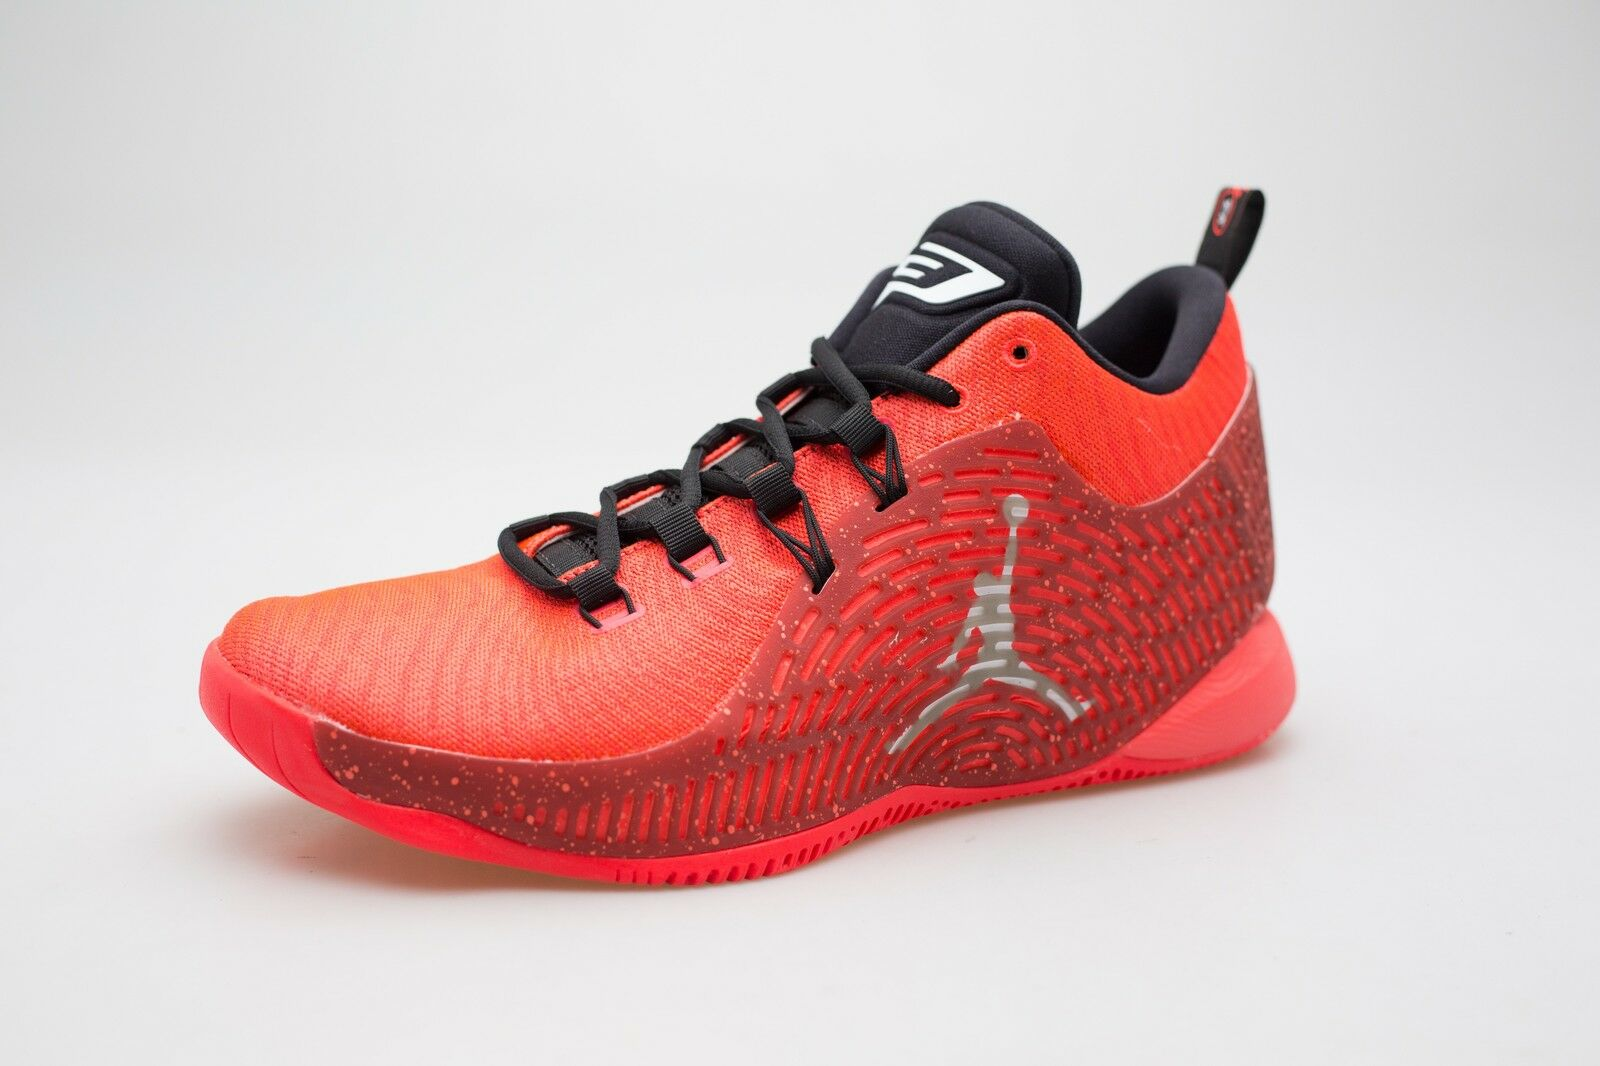 The most popular shoes for men and women 854294-600 Jordan Men Jordan CP3.X Basketball Infrared 23